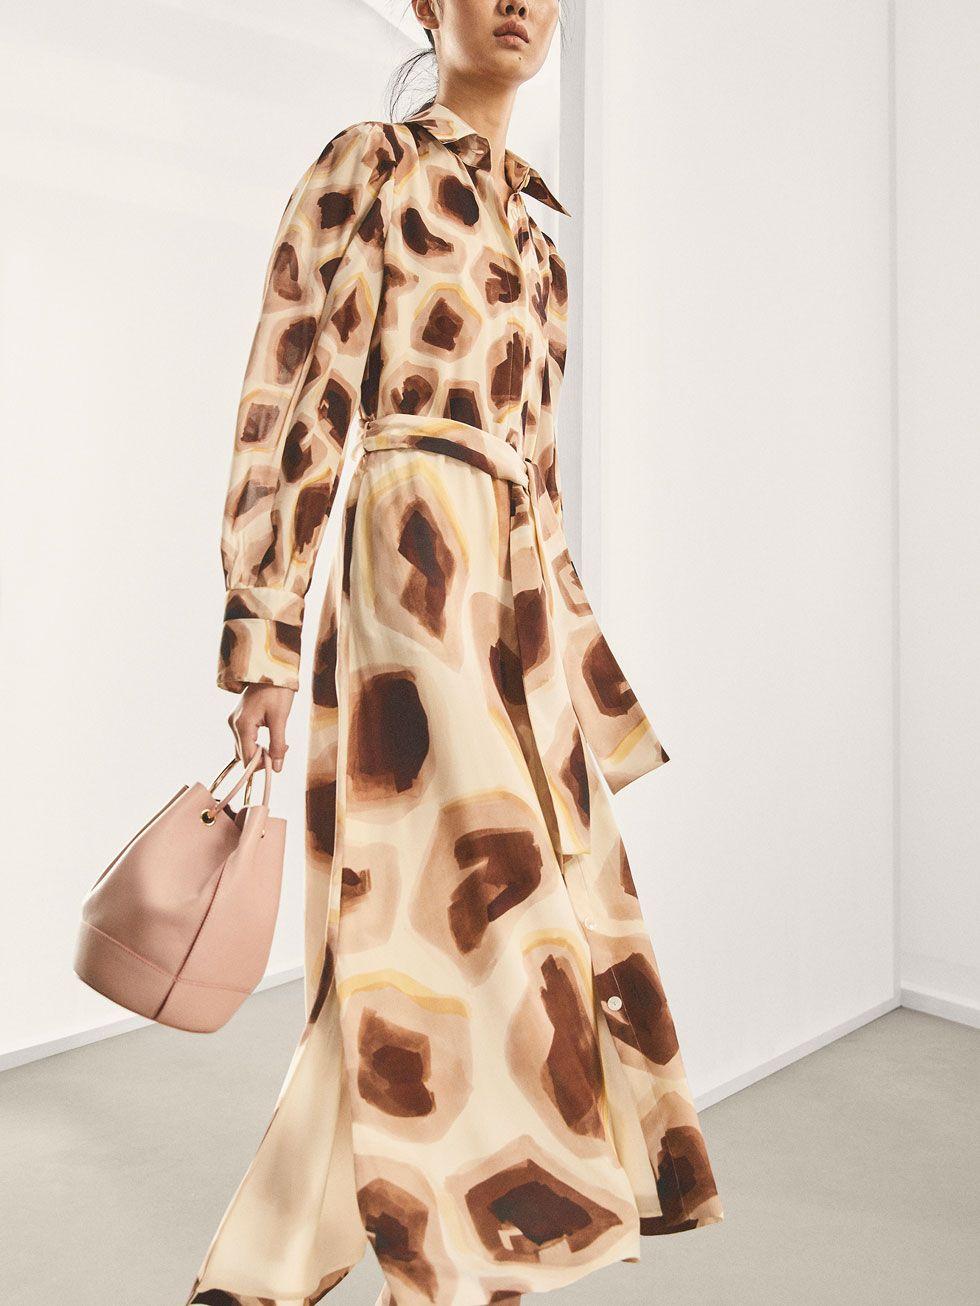 1db0c45c31 LIMITED EDITION GIRAFFE PRINT SILK DRESS - Women - Massimo Dutti ...